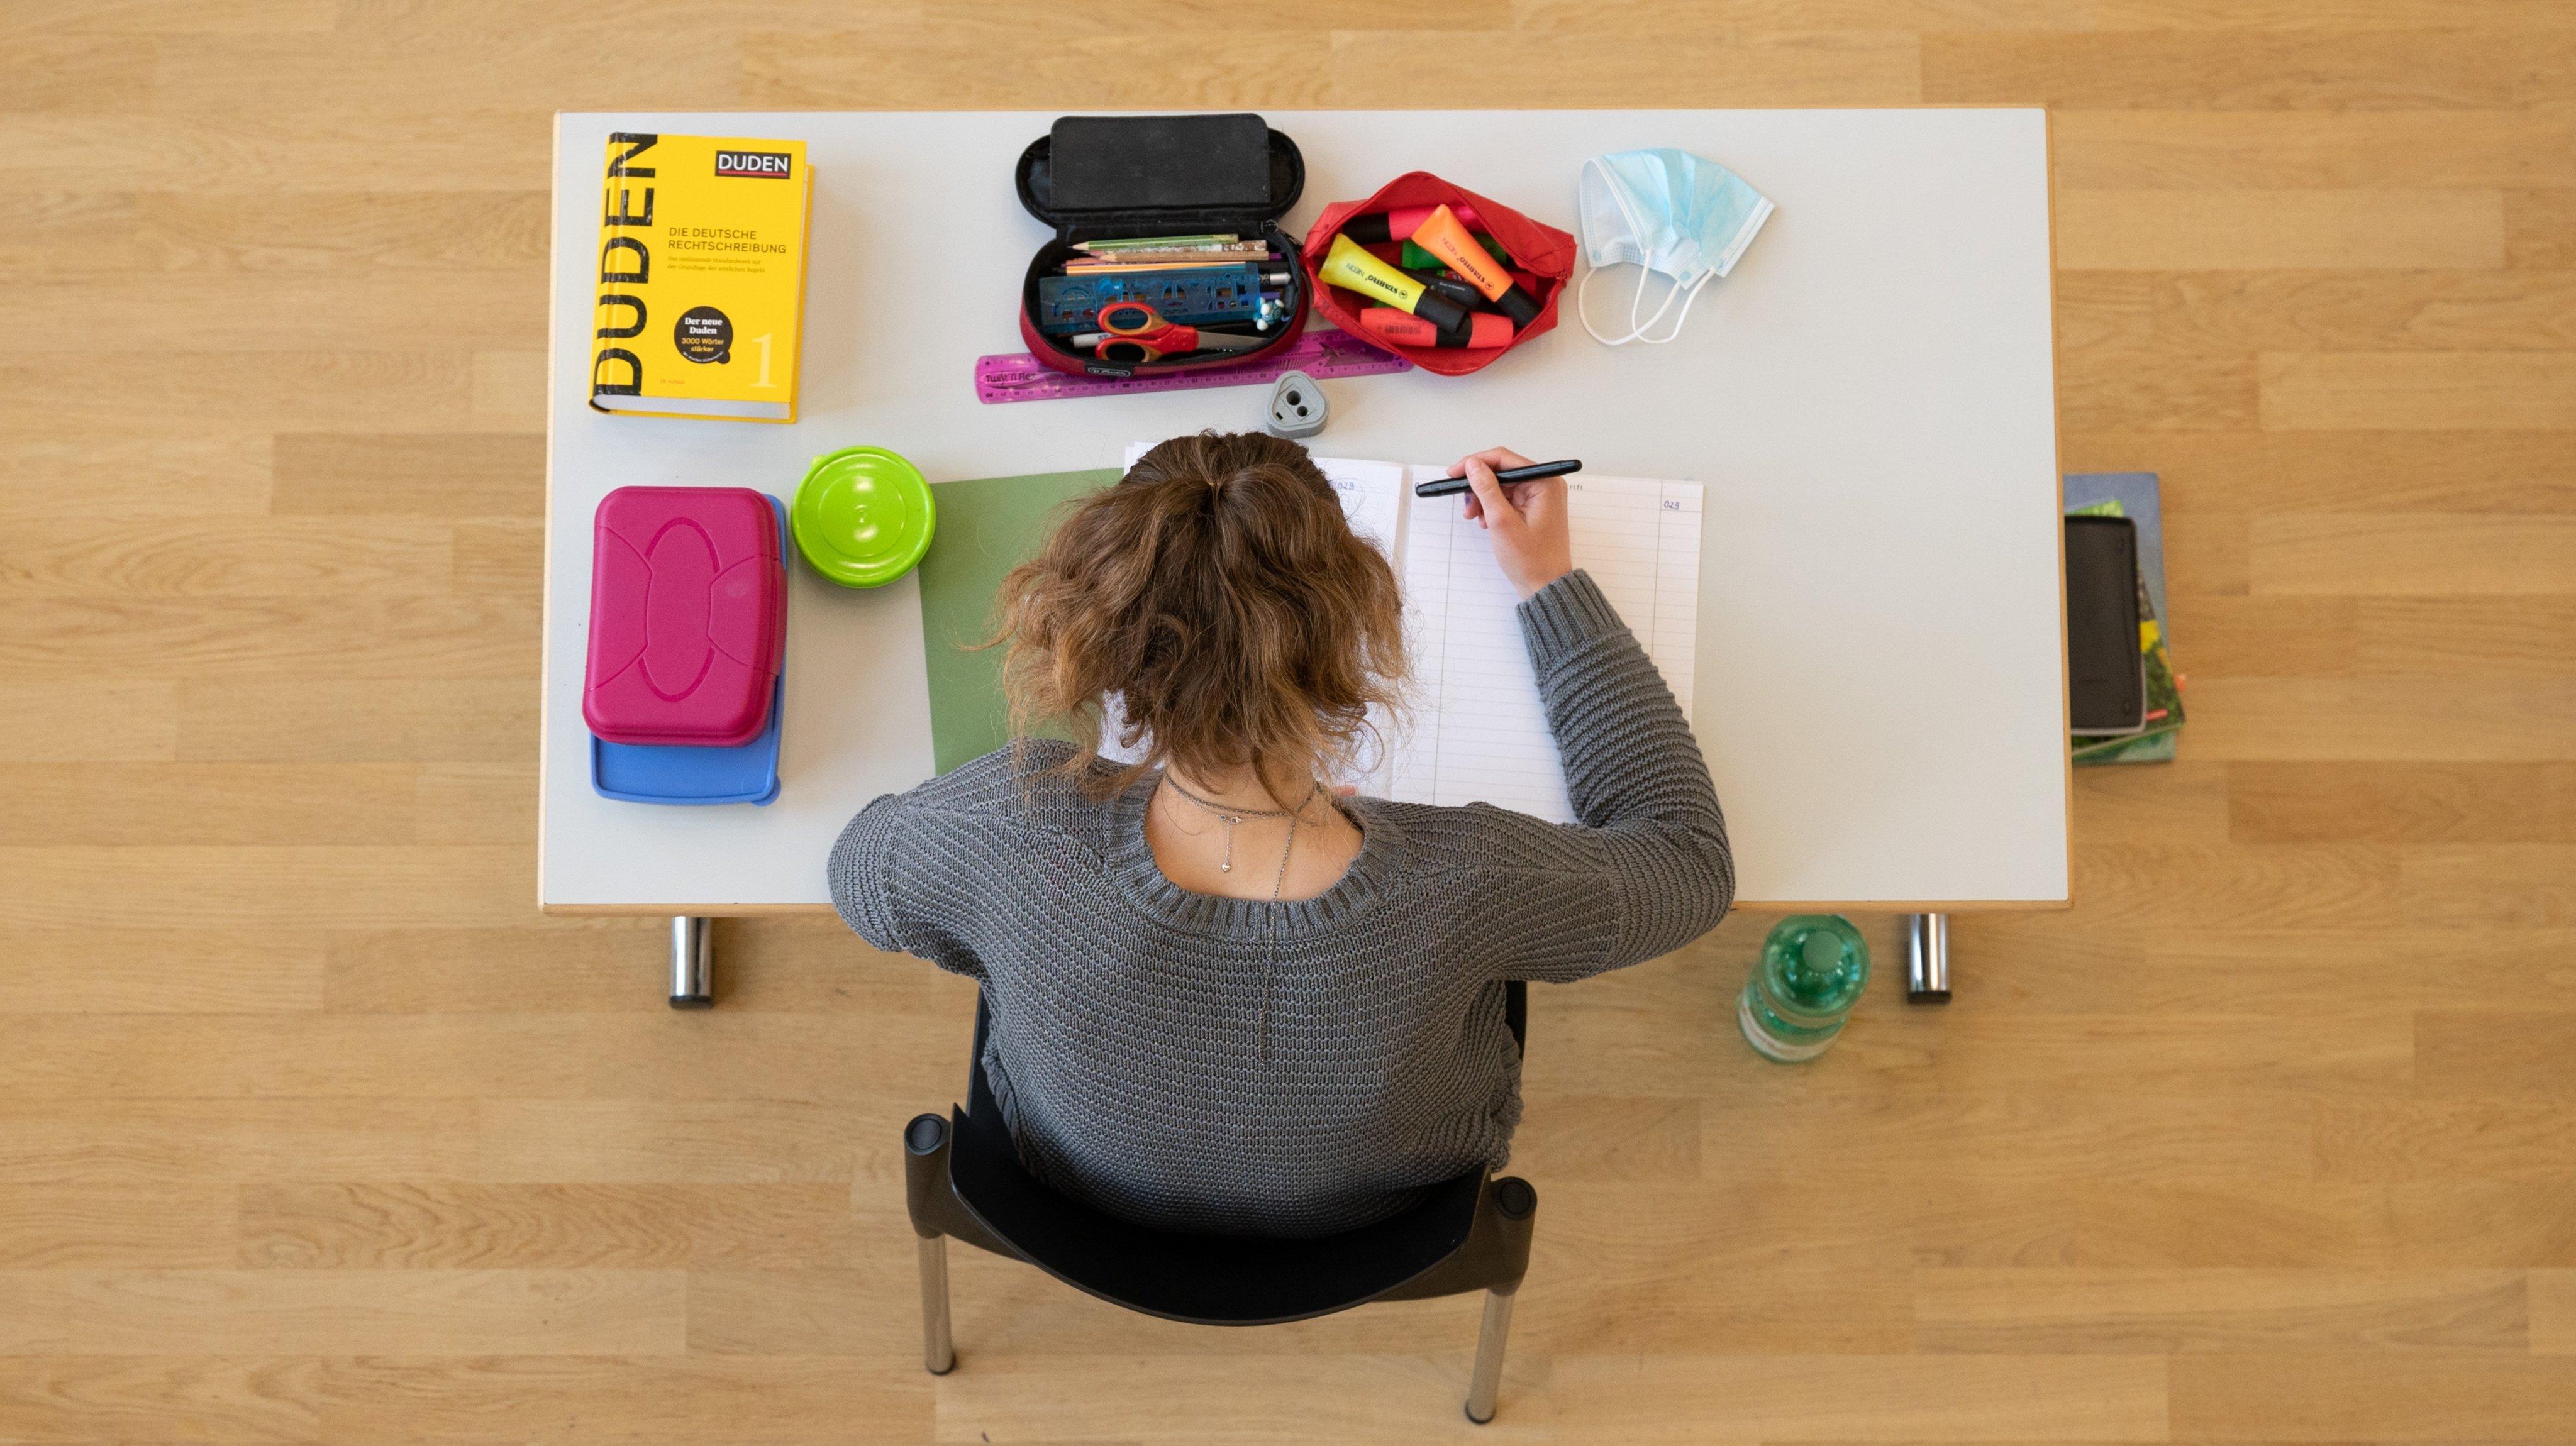 Saxony Abitur examinations